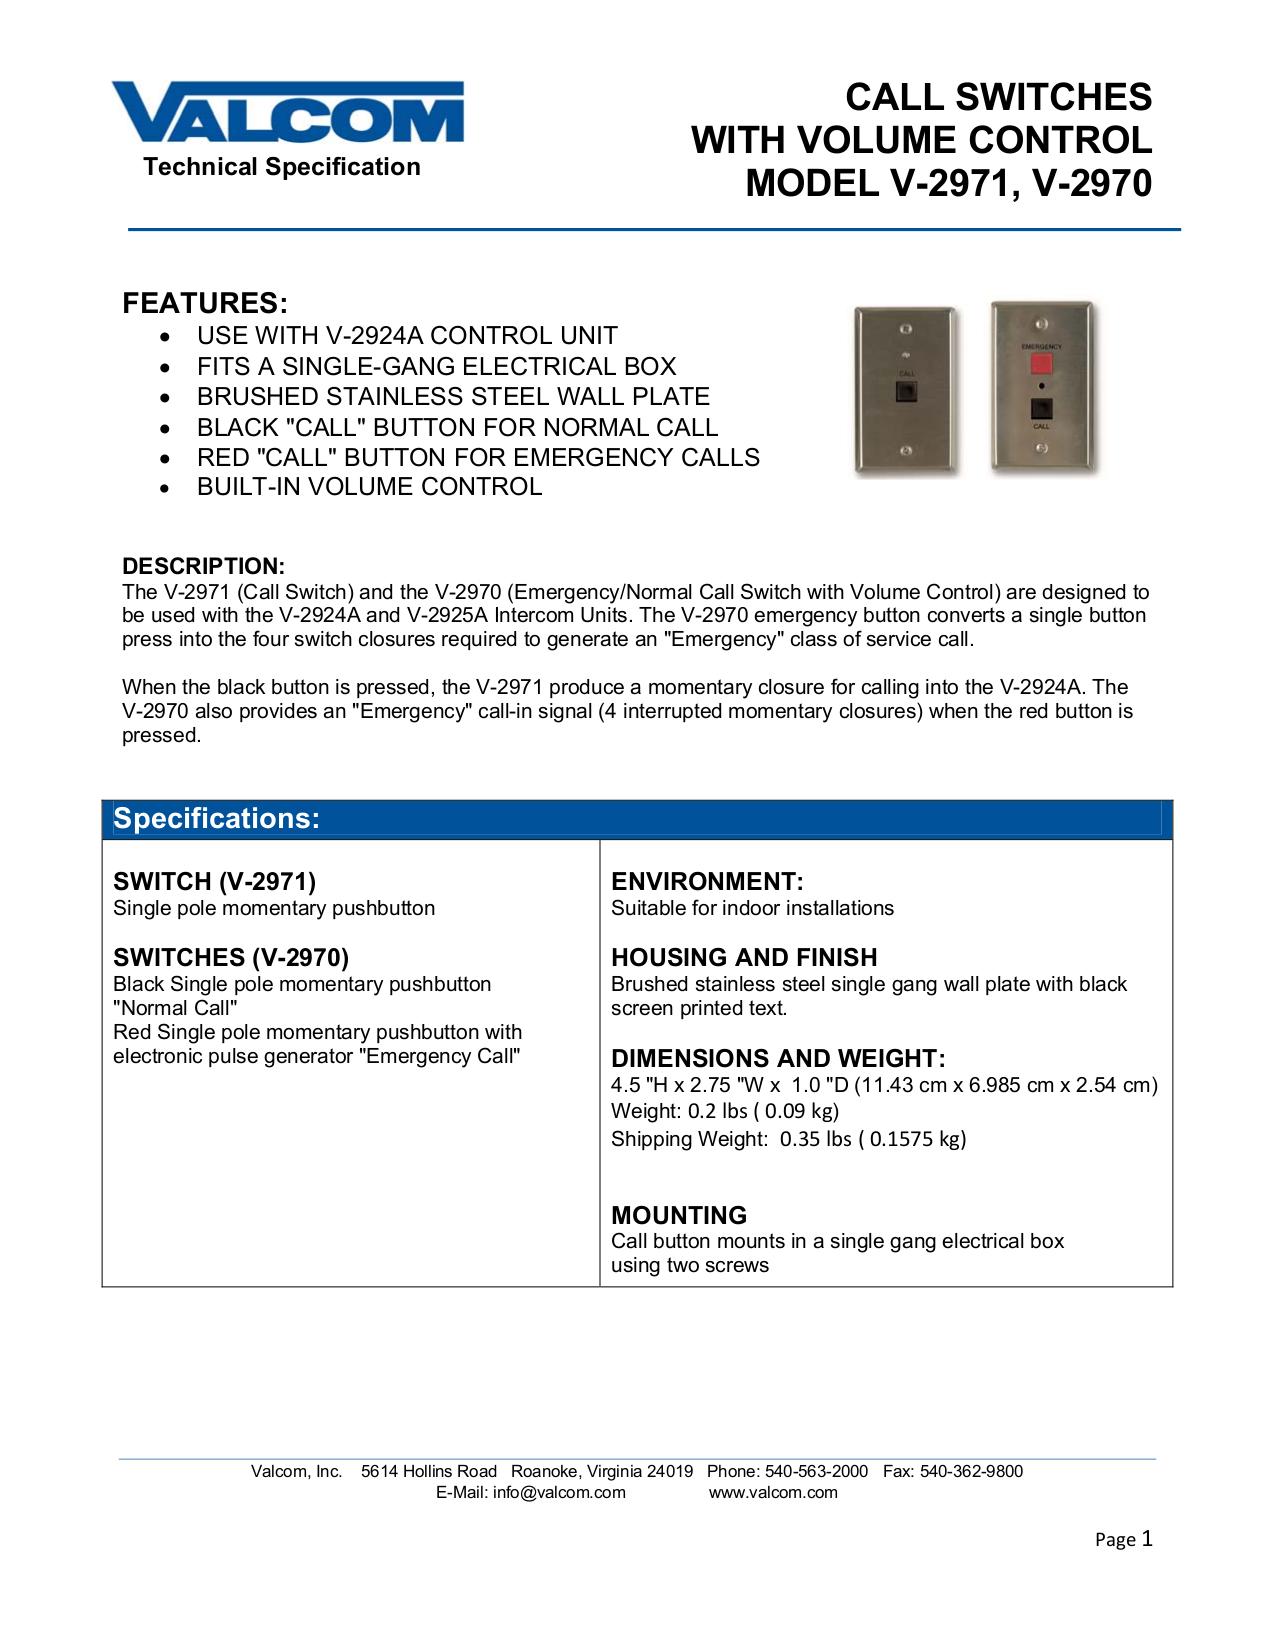 pdf for Valcom Switch V2971 manual